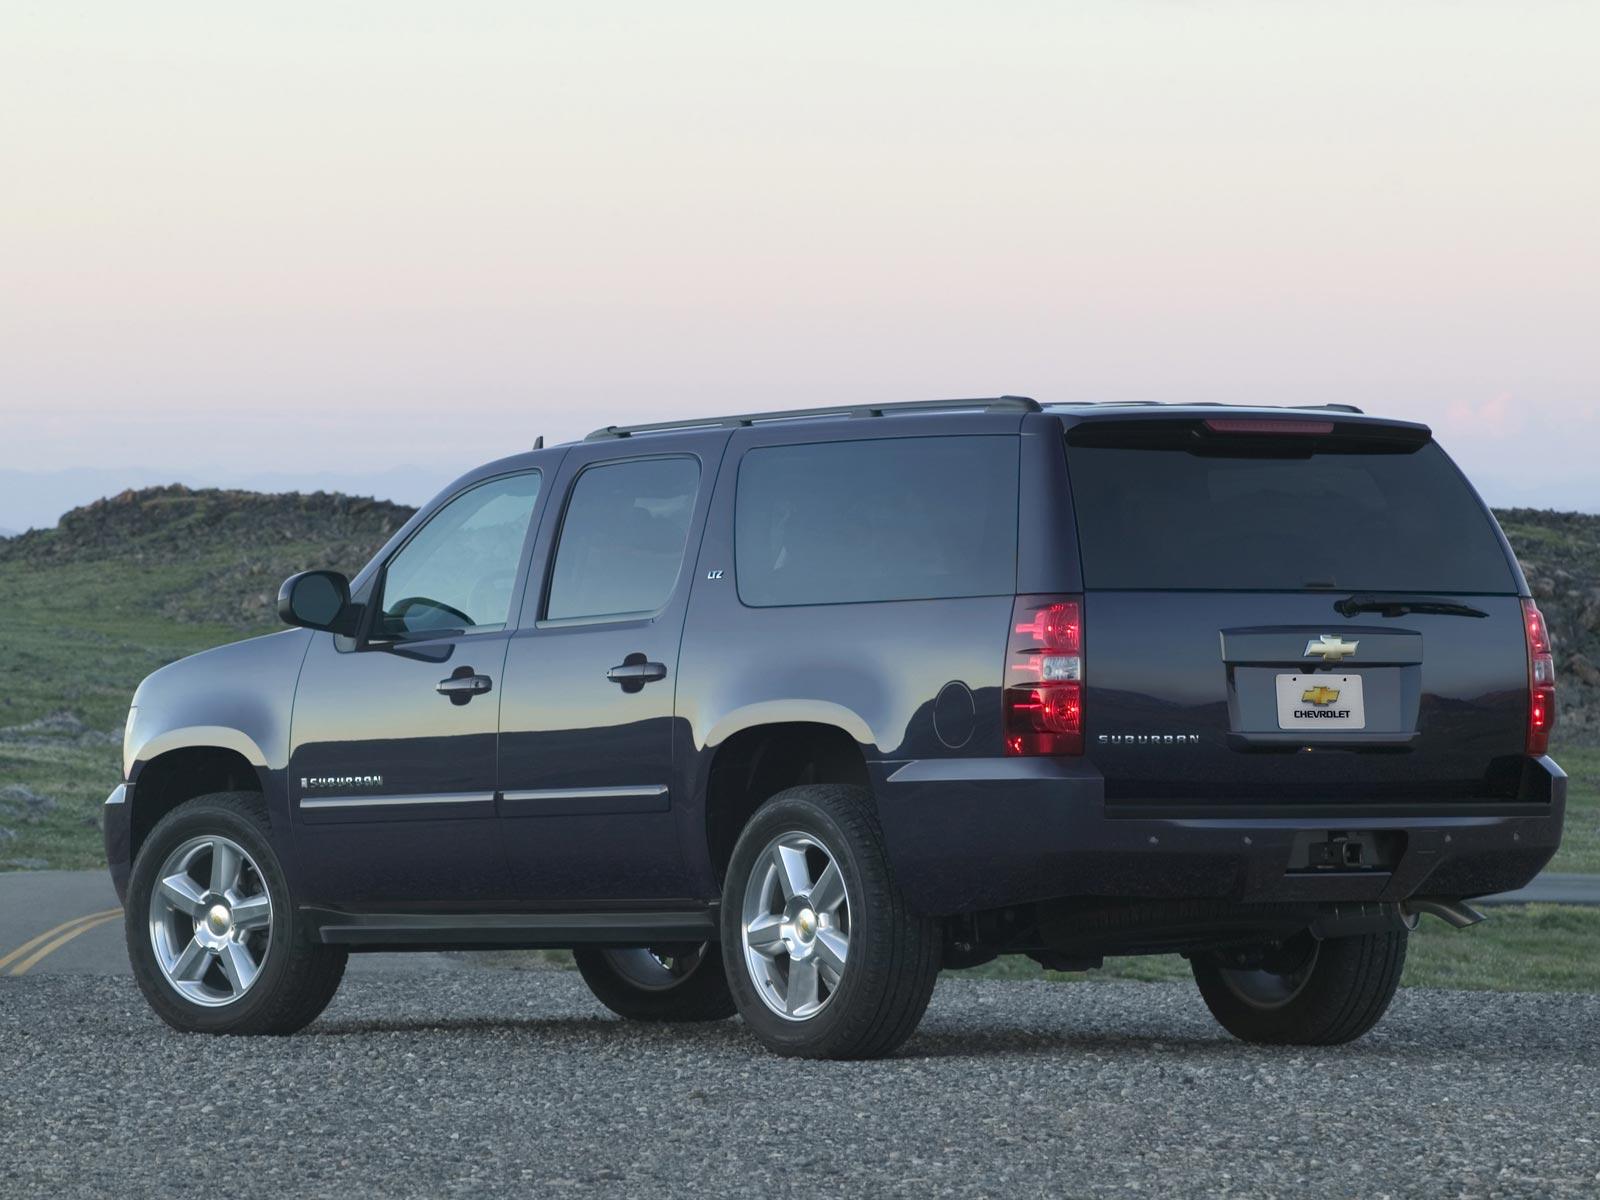 2007 2013 Chevrolet Suburban Autoguru Katalog At